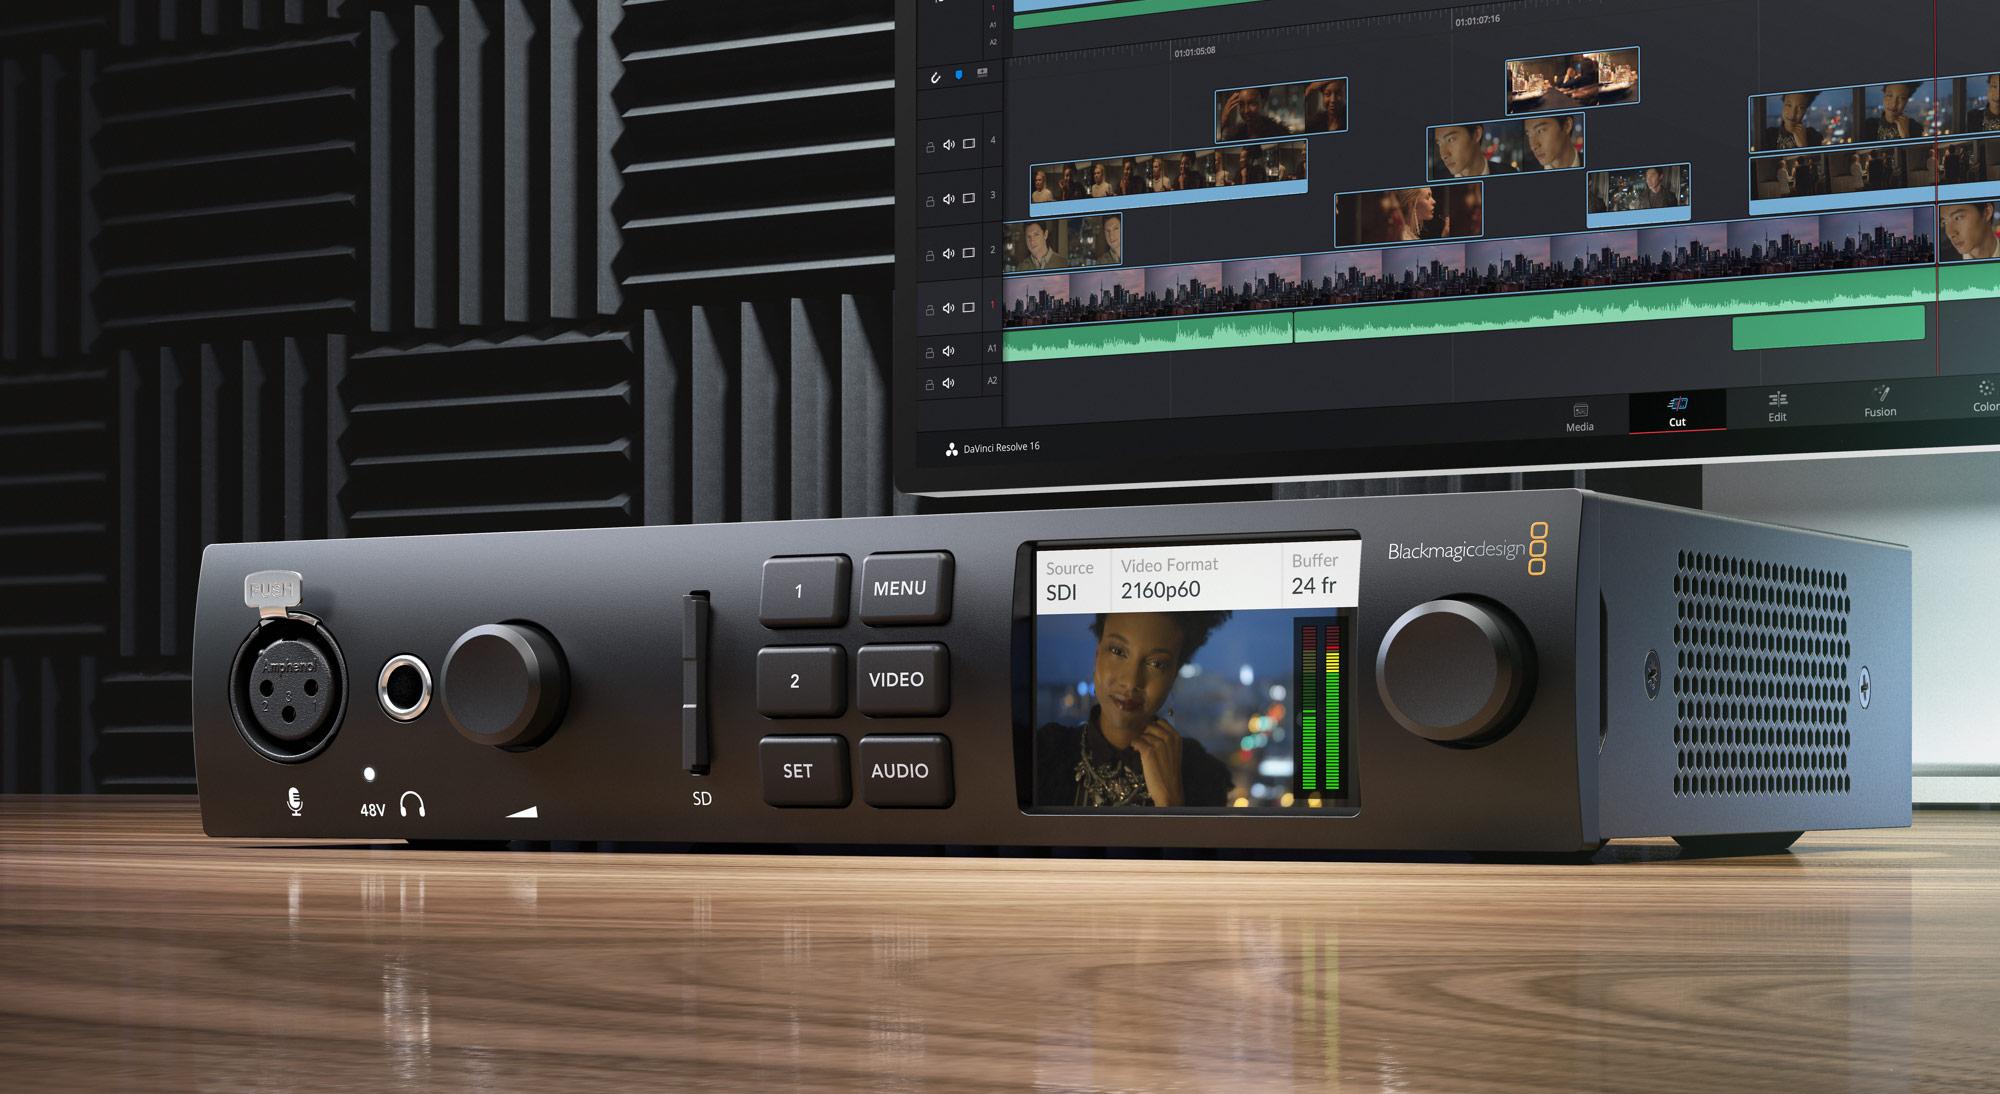 Blackmagic Design Announces New Ultrastudio 4k Mini Broadcasting Cable